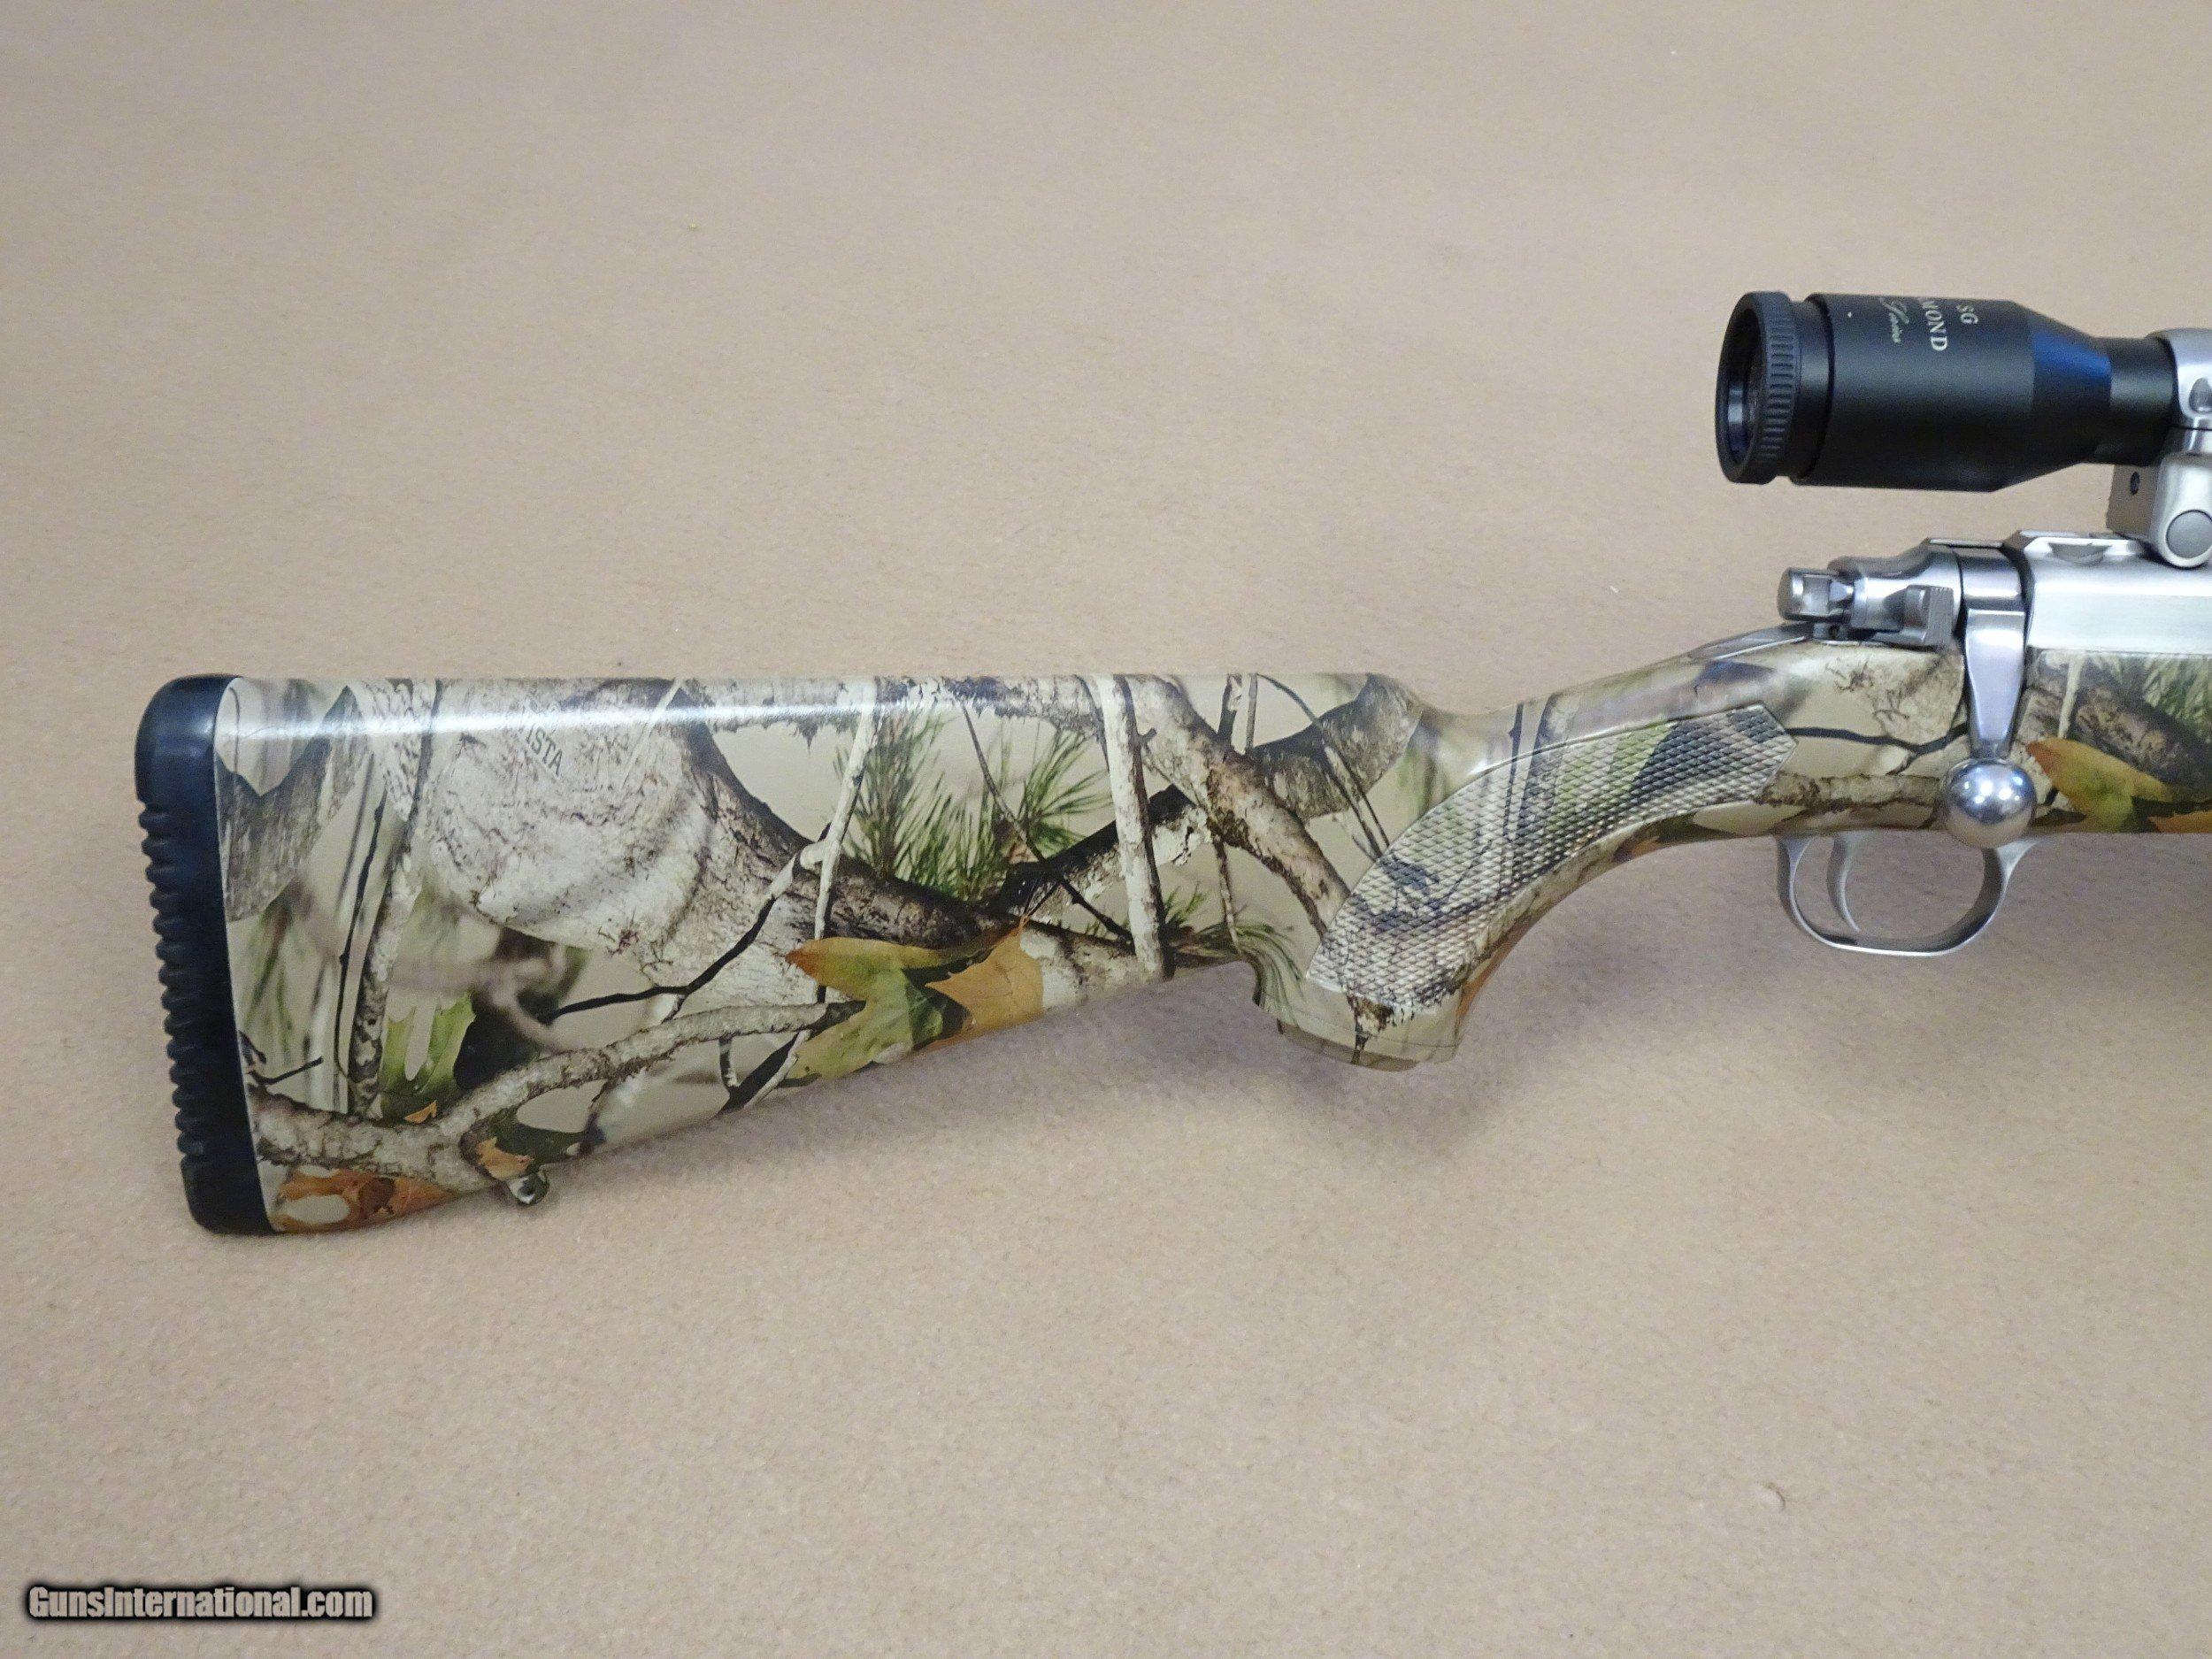 ... Ruger Model 77/44 .44 Magnum Stainless Carbine w/ Scope & Original Box  ...